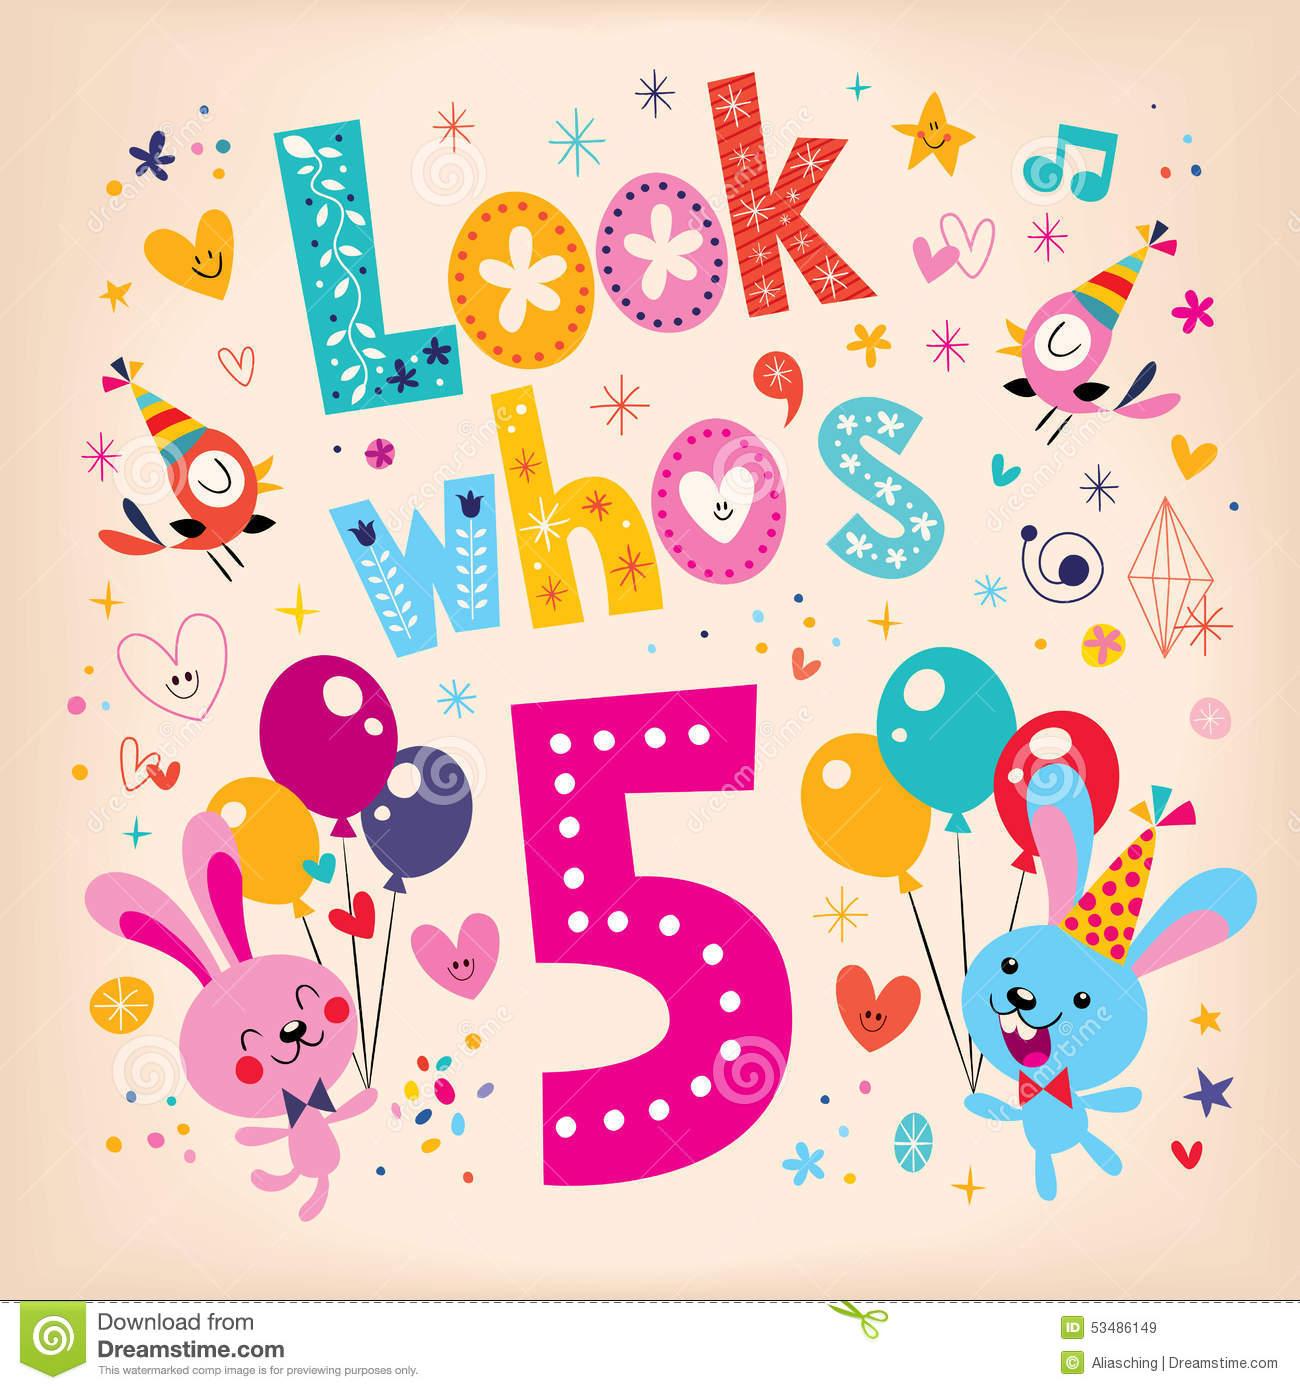 Awosme 5th Birthday Wishes 2016 Birthday Wishes Zone Happy 39th Birthday Wishes